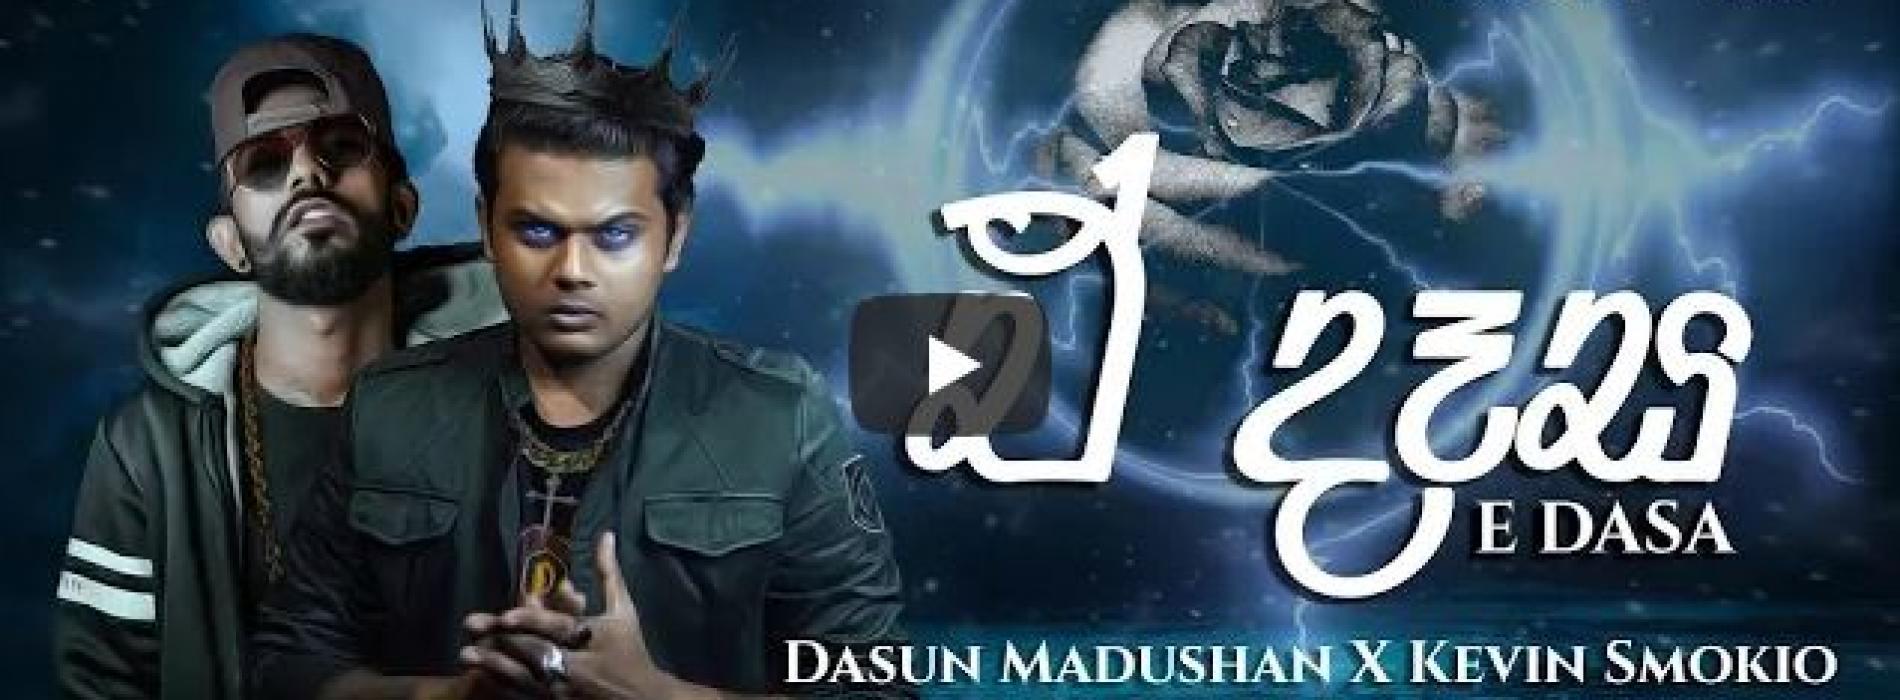 New Music : E Dasa (ඒ දෑස) – Dasun Madushan X Kevin Smokio (Official Lyrics Video)